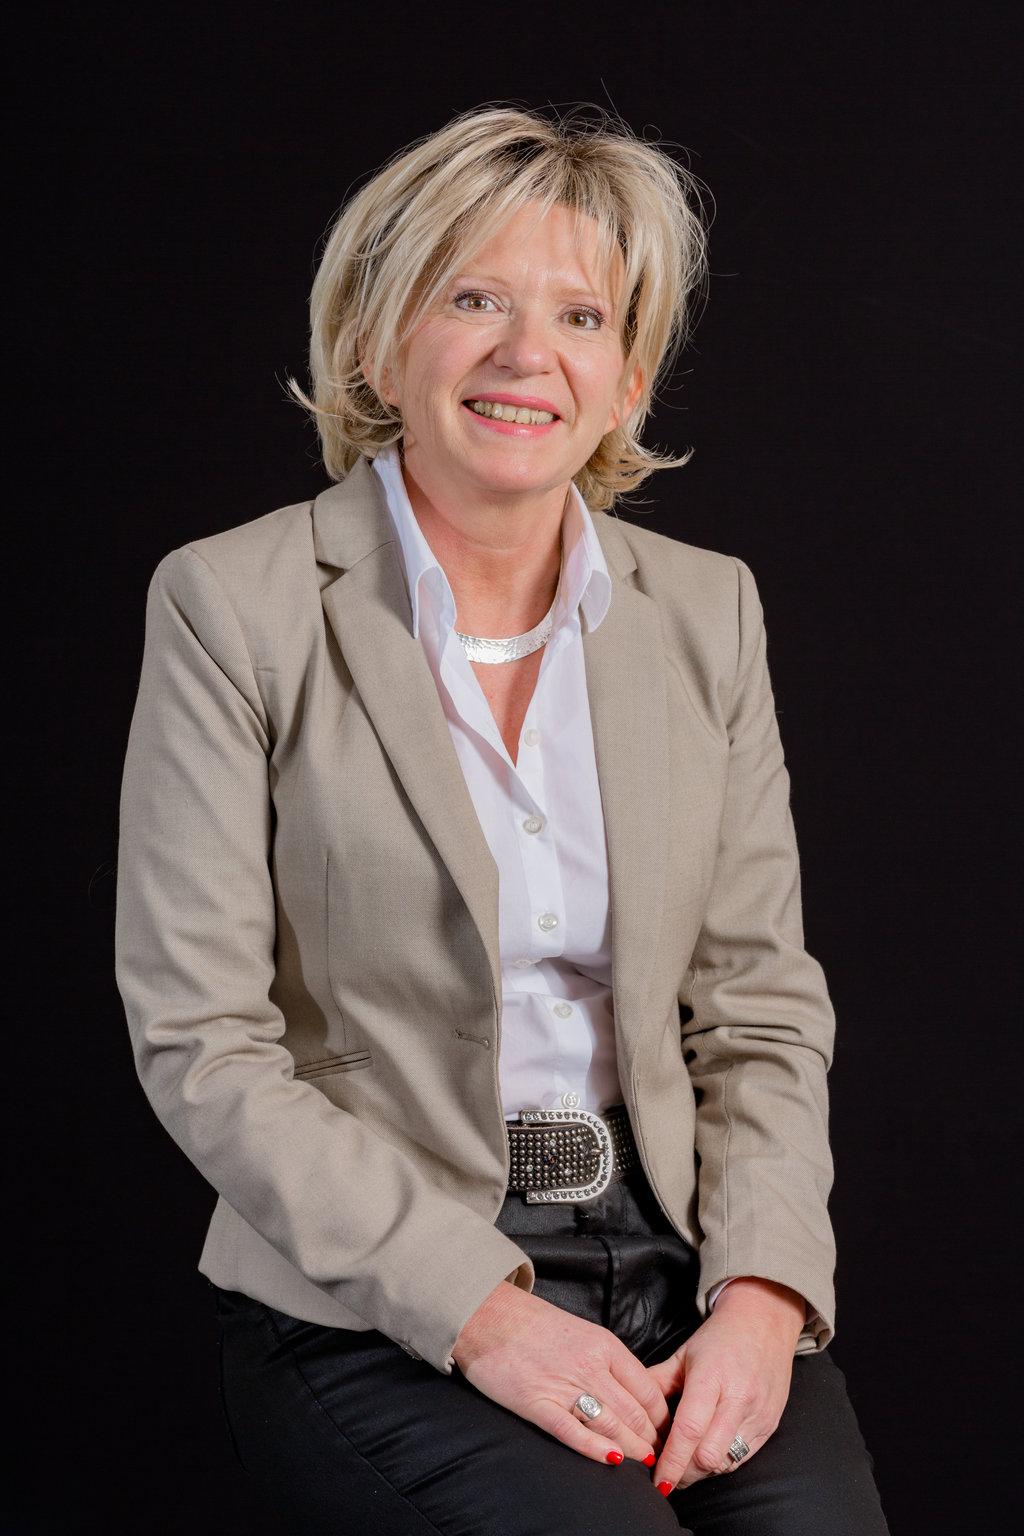 Marianne Nowak